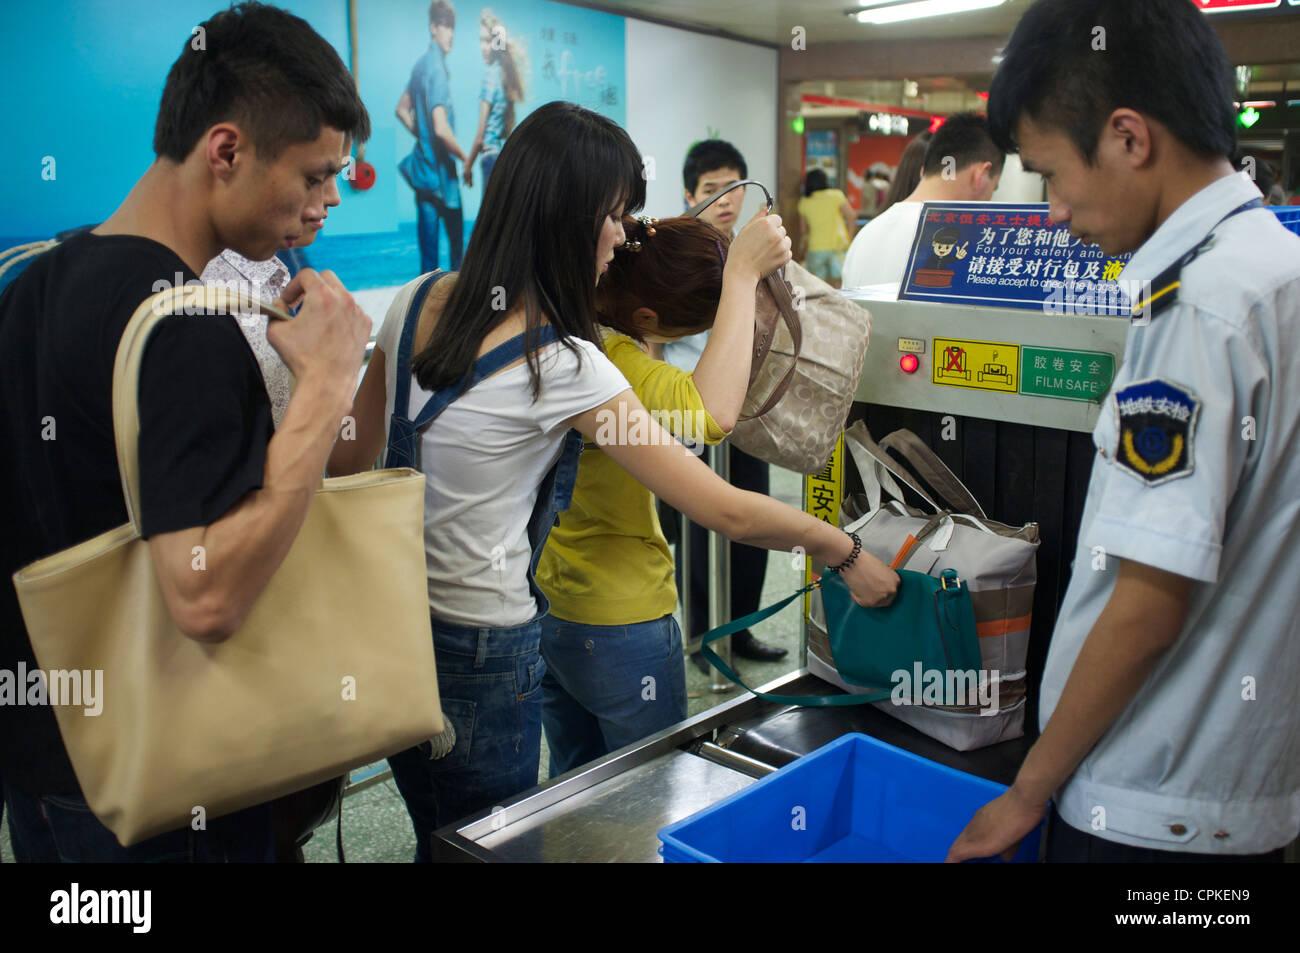 Subway security bag check in Beijing, China. 25-May-2012 - Stock Image